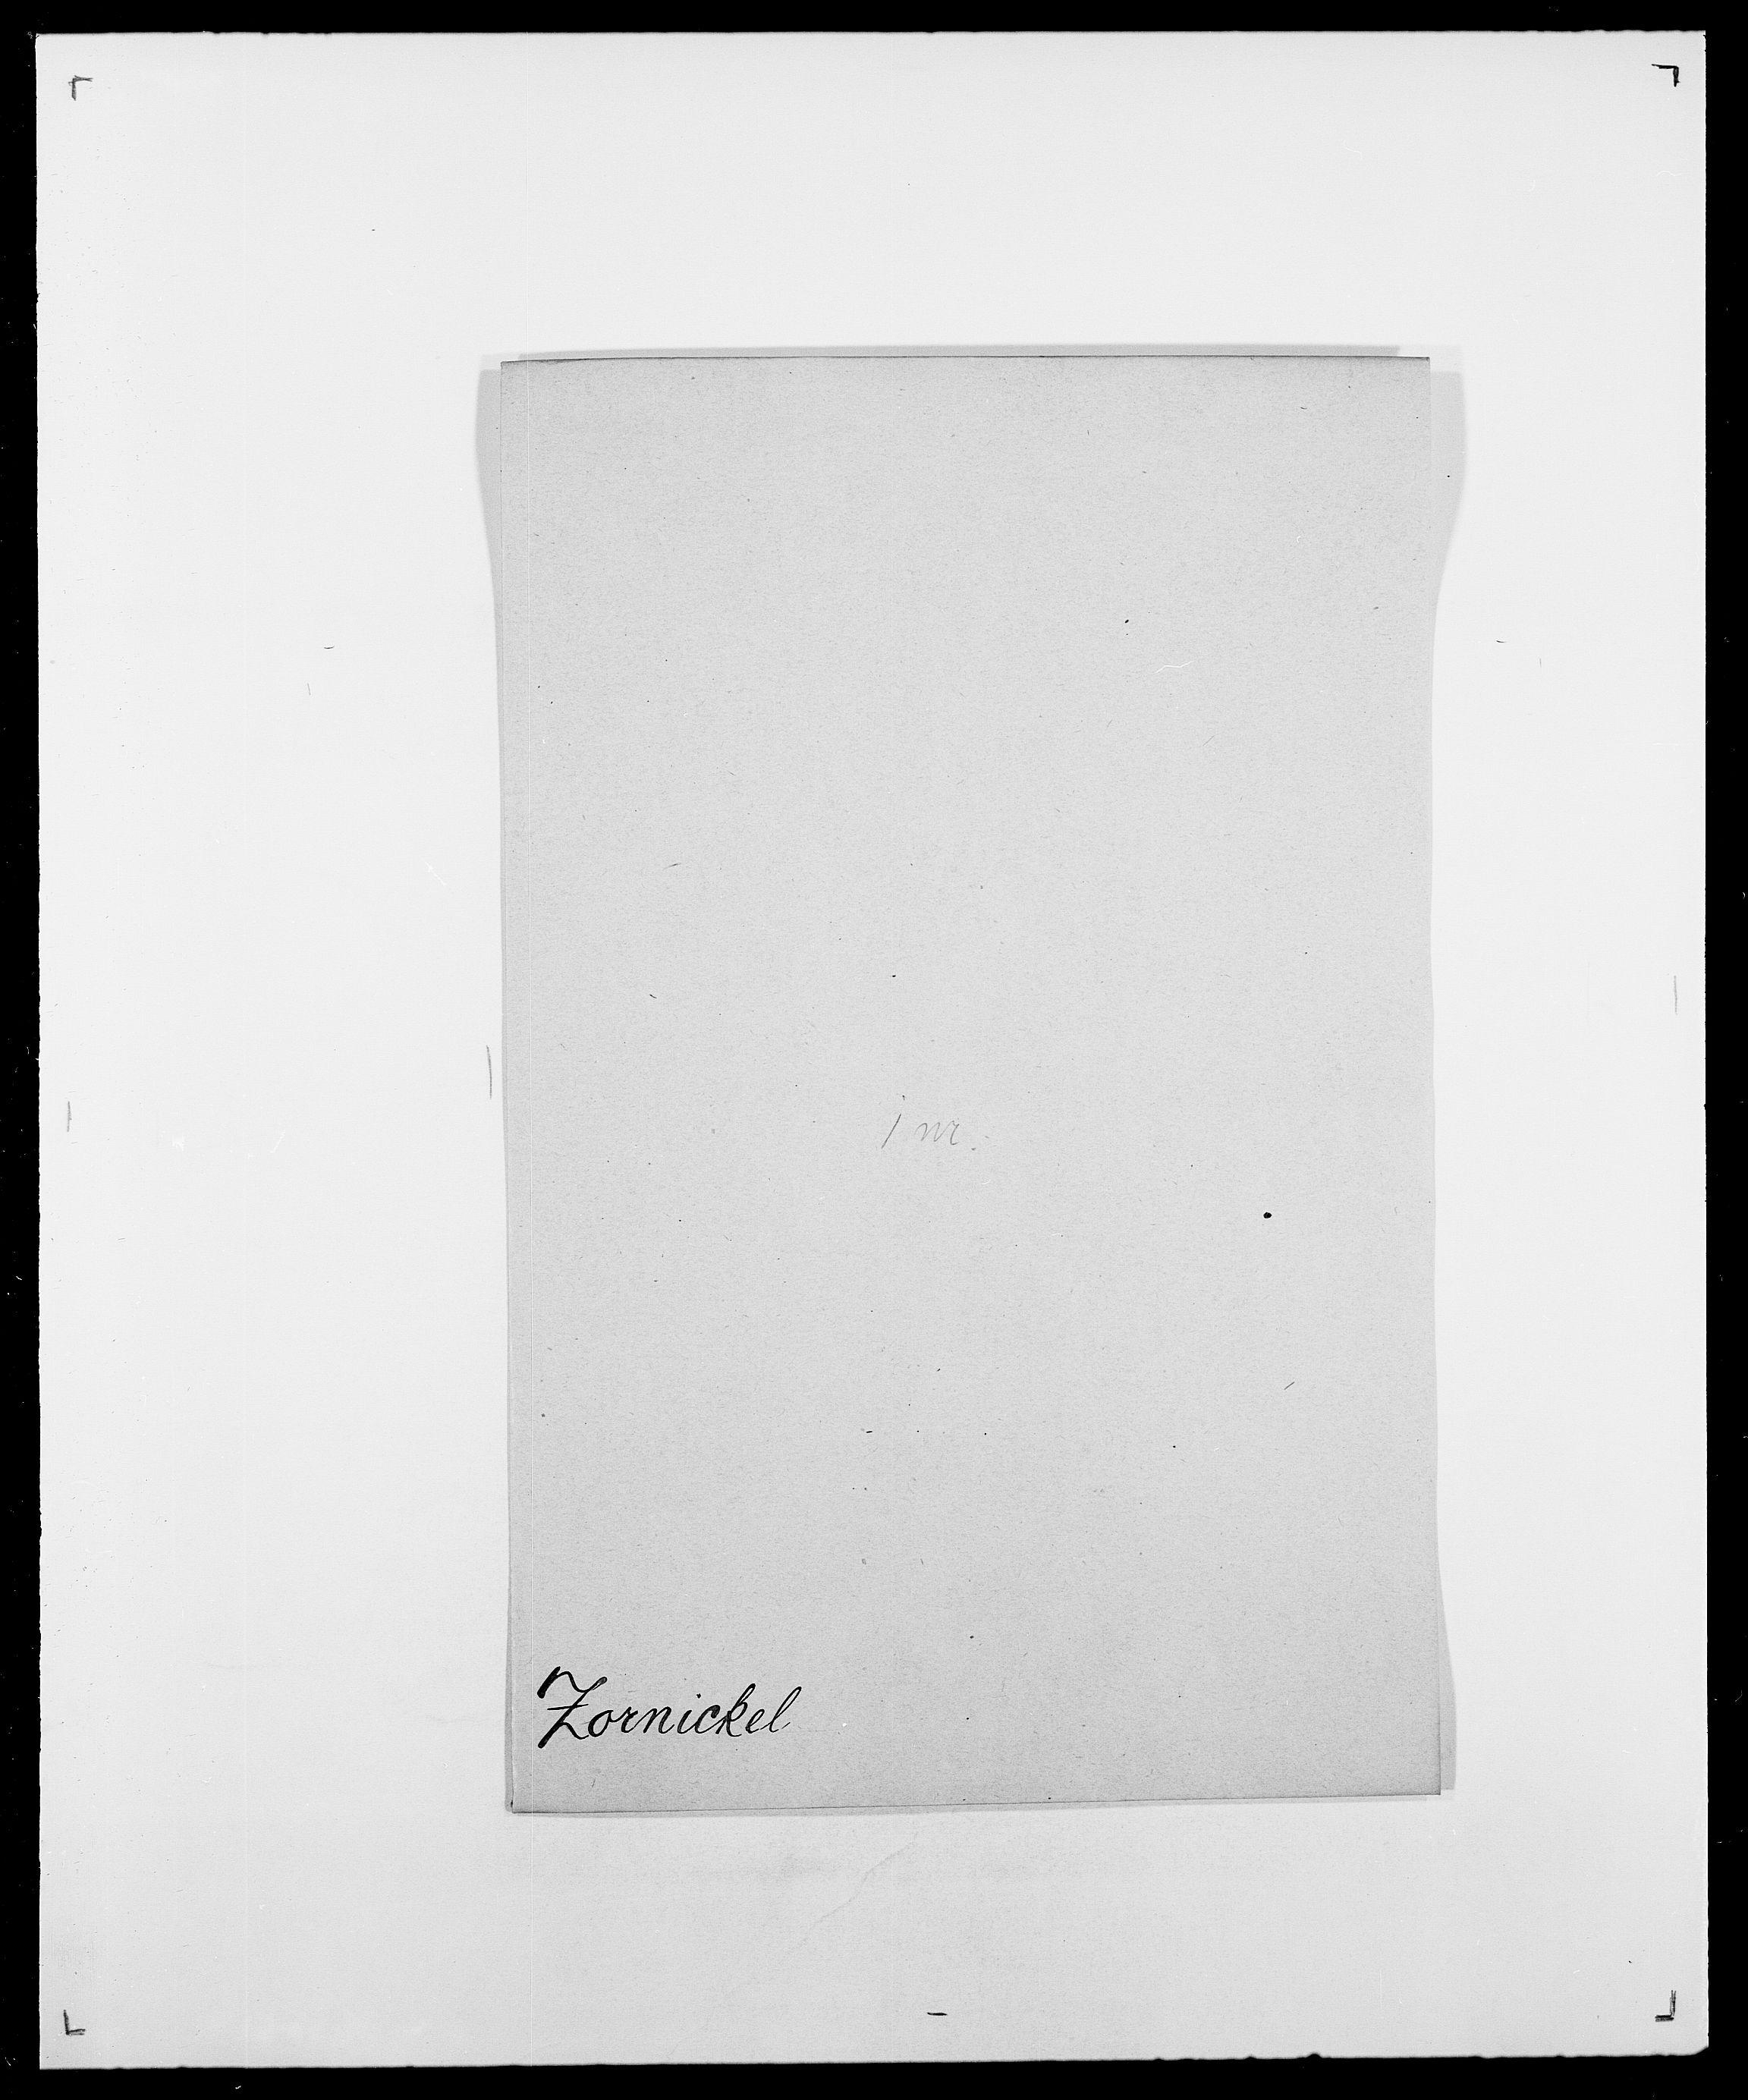 SAO, Delgobe, Charles Antoine - samling, D/Da/L0043: Wulfsberg - v. Zanten, s. 208